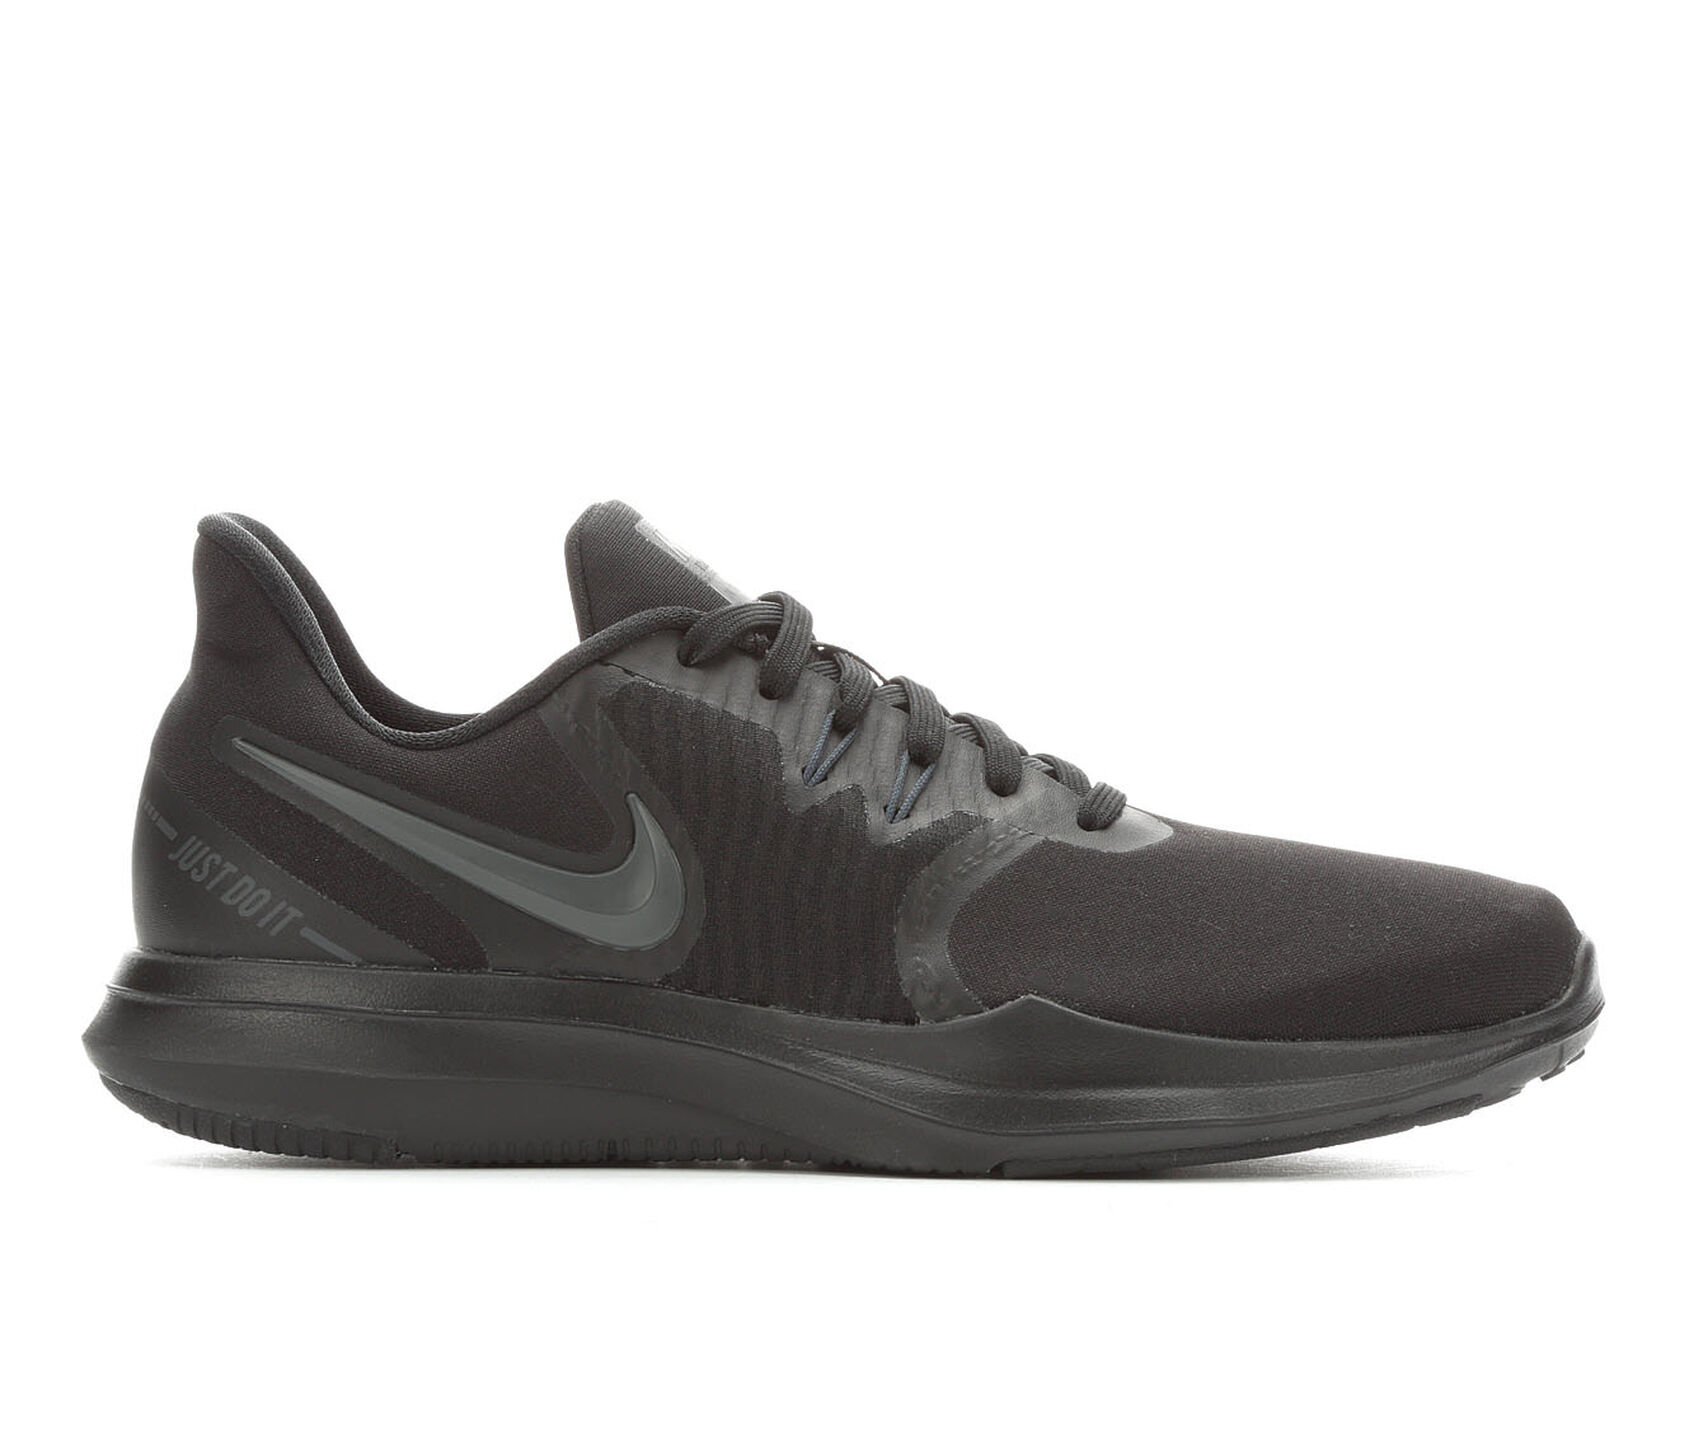 2851f7438fb42 Women s Nike In-Season TR 8 Training Shoes